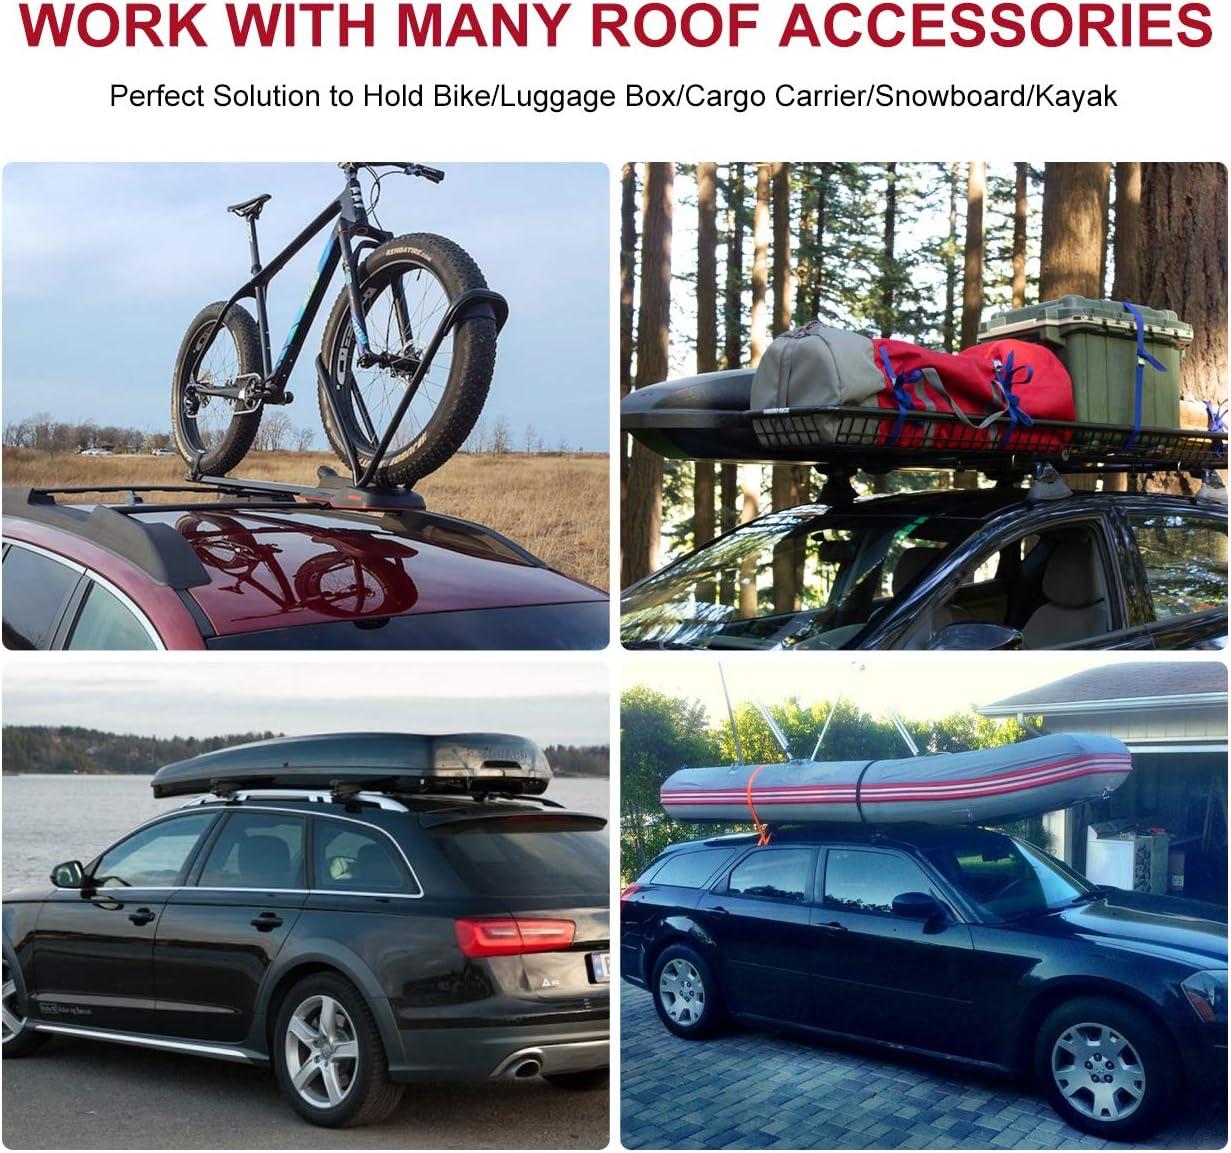 Factory Side Rails Needed ALAVENTE Roof Rack Crossbars for Mazda CX-5 2017 2018 2019 Luggage Roof Rack Rail Cross Bar Mazda CX-5 CX5 2017-2019